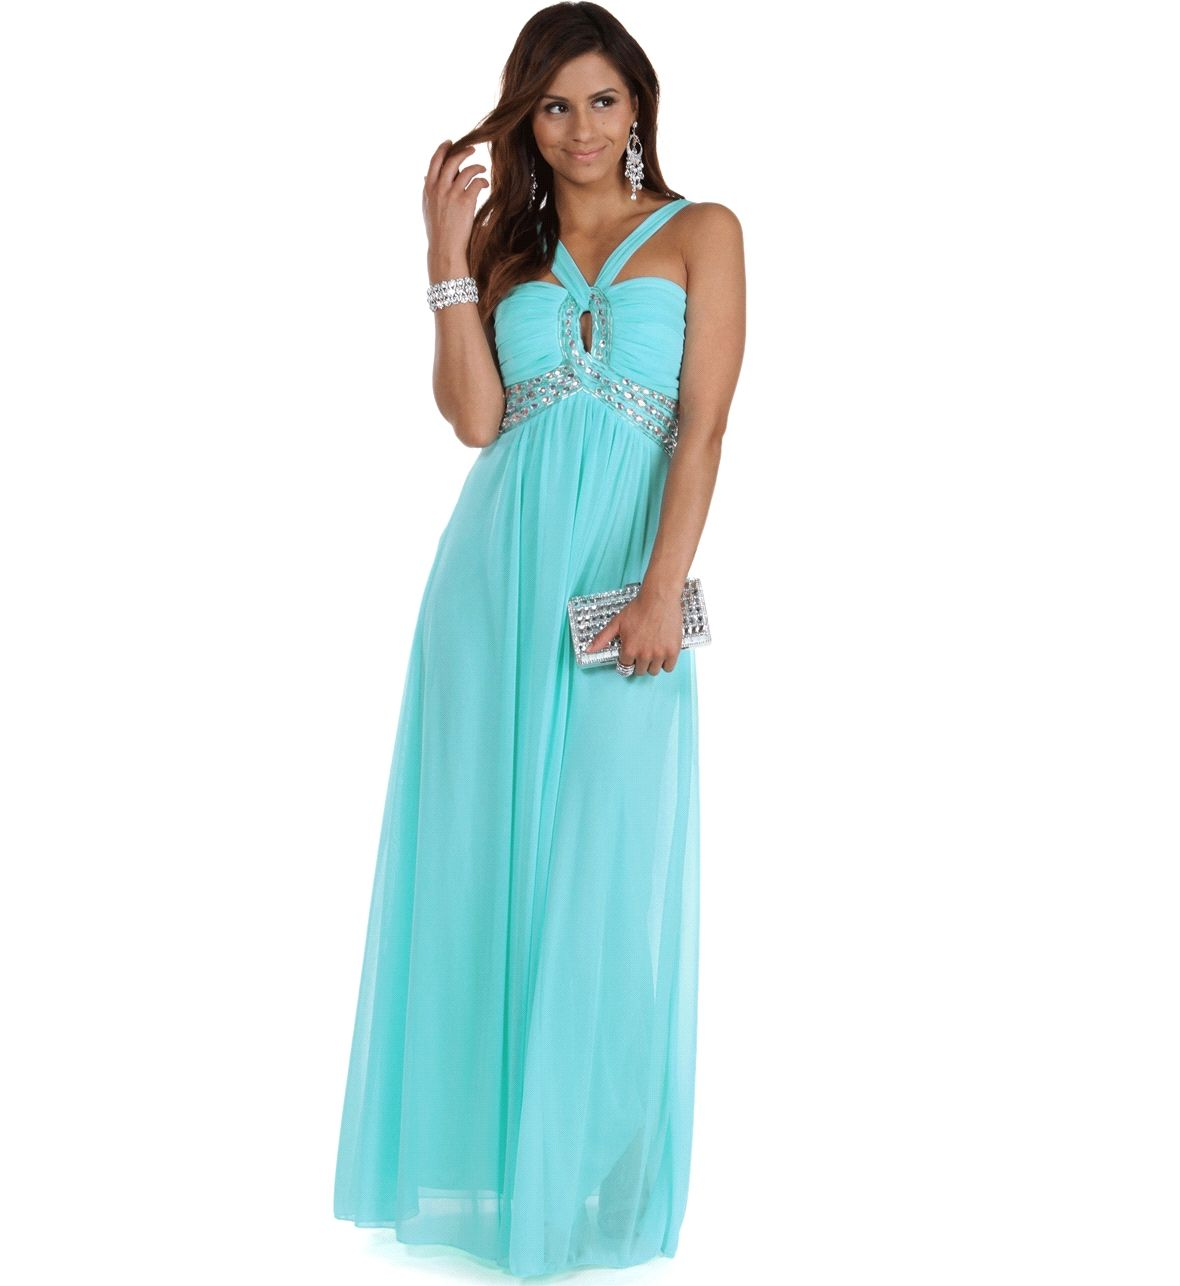 Lila turquoise prom dress dresses pinterest turquoise prom